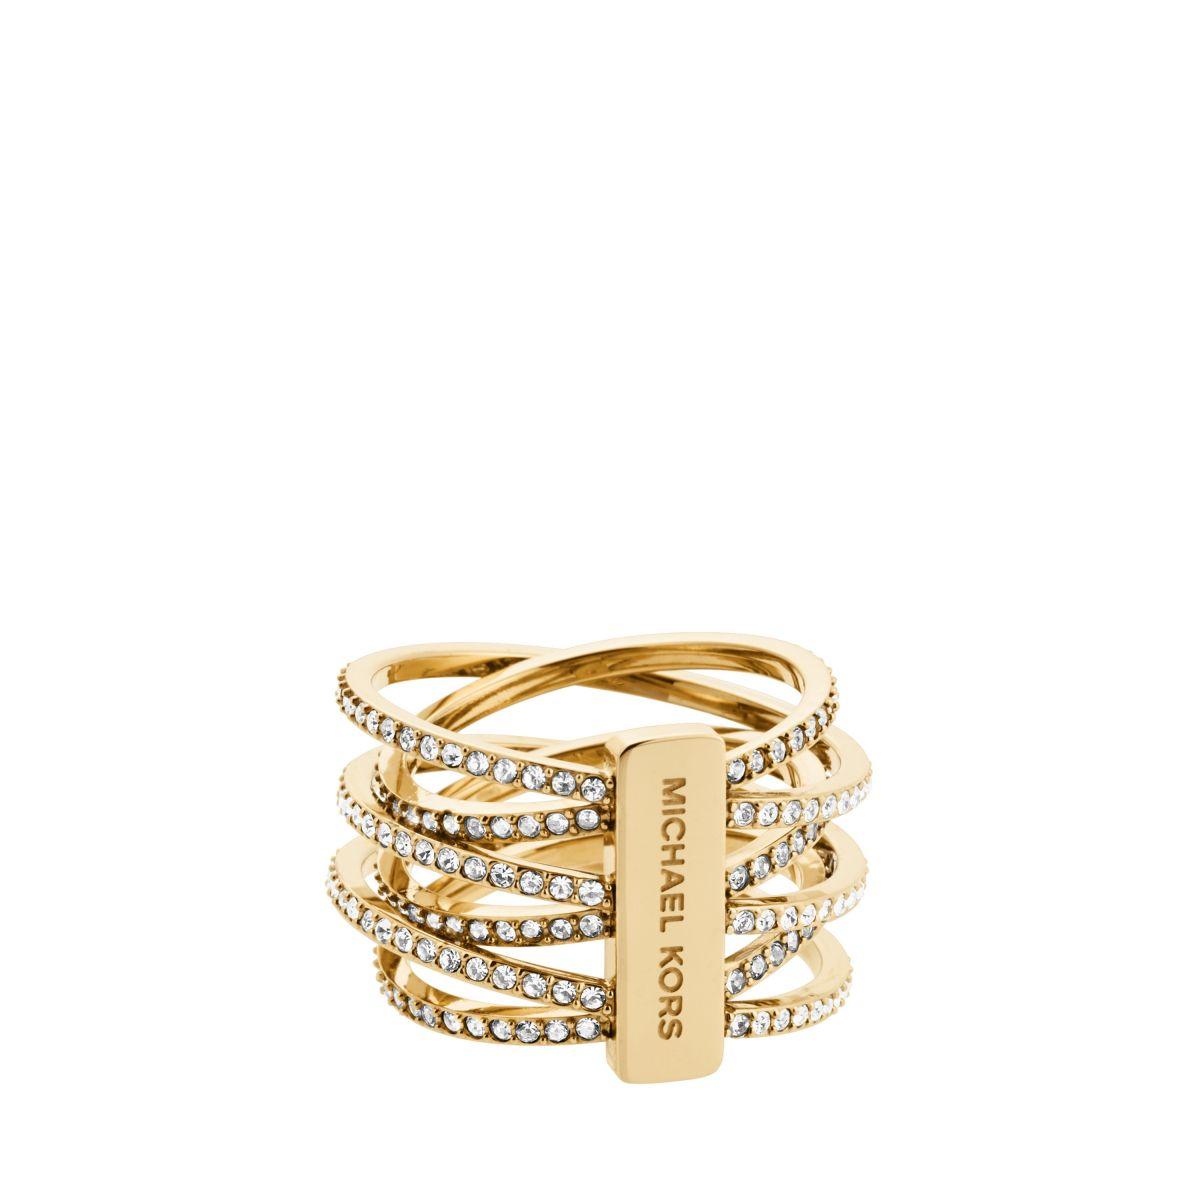 Vivienne Westwood Ring Watch